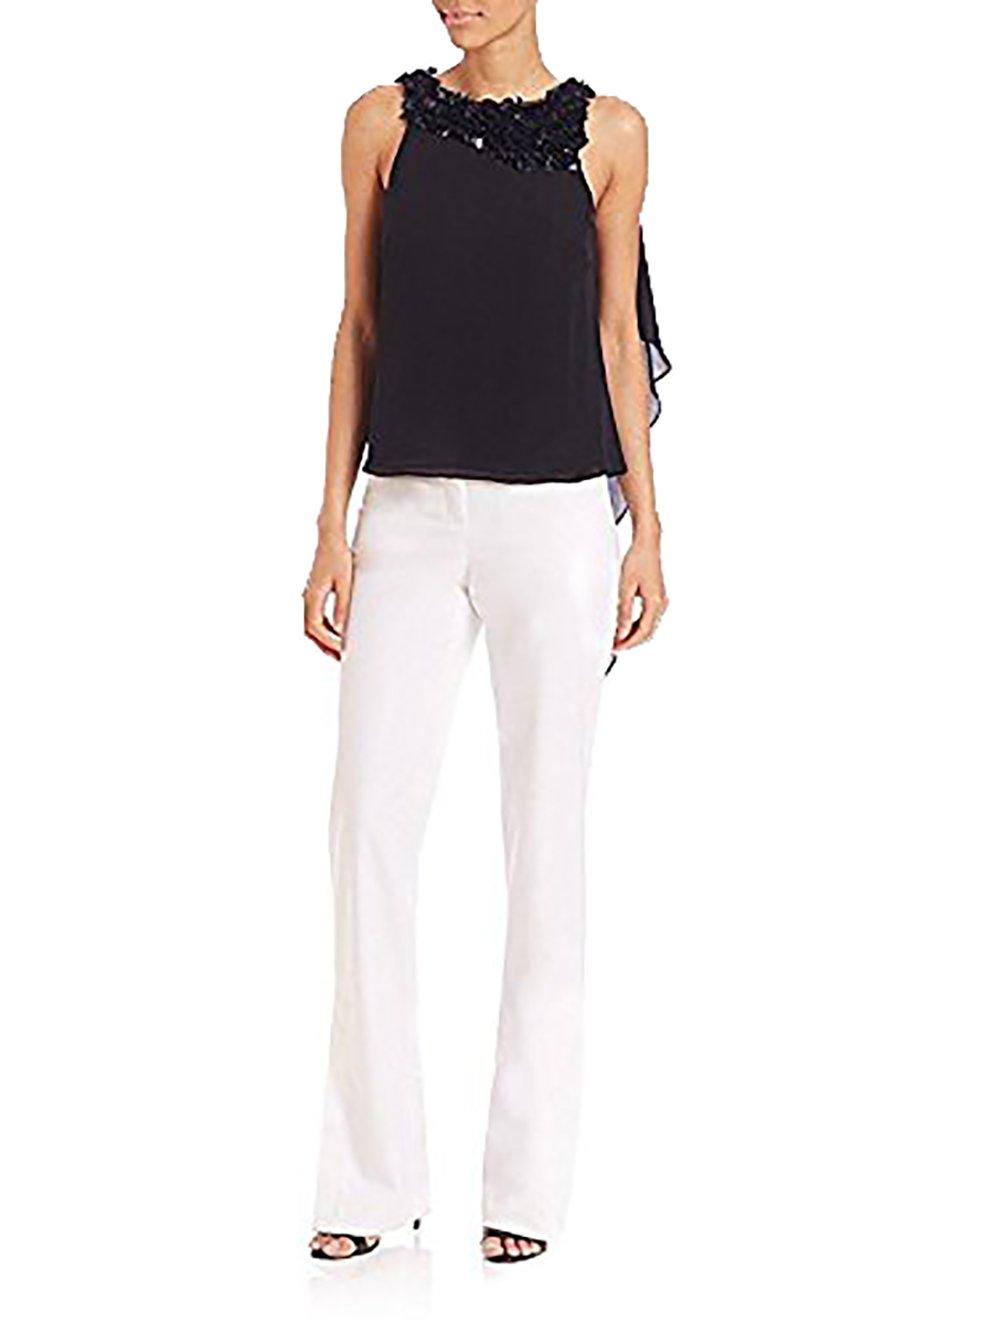 Halston Heritage Slim Boot Pants ,White (6)